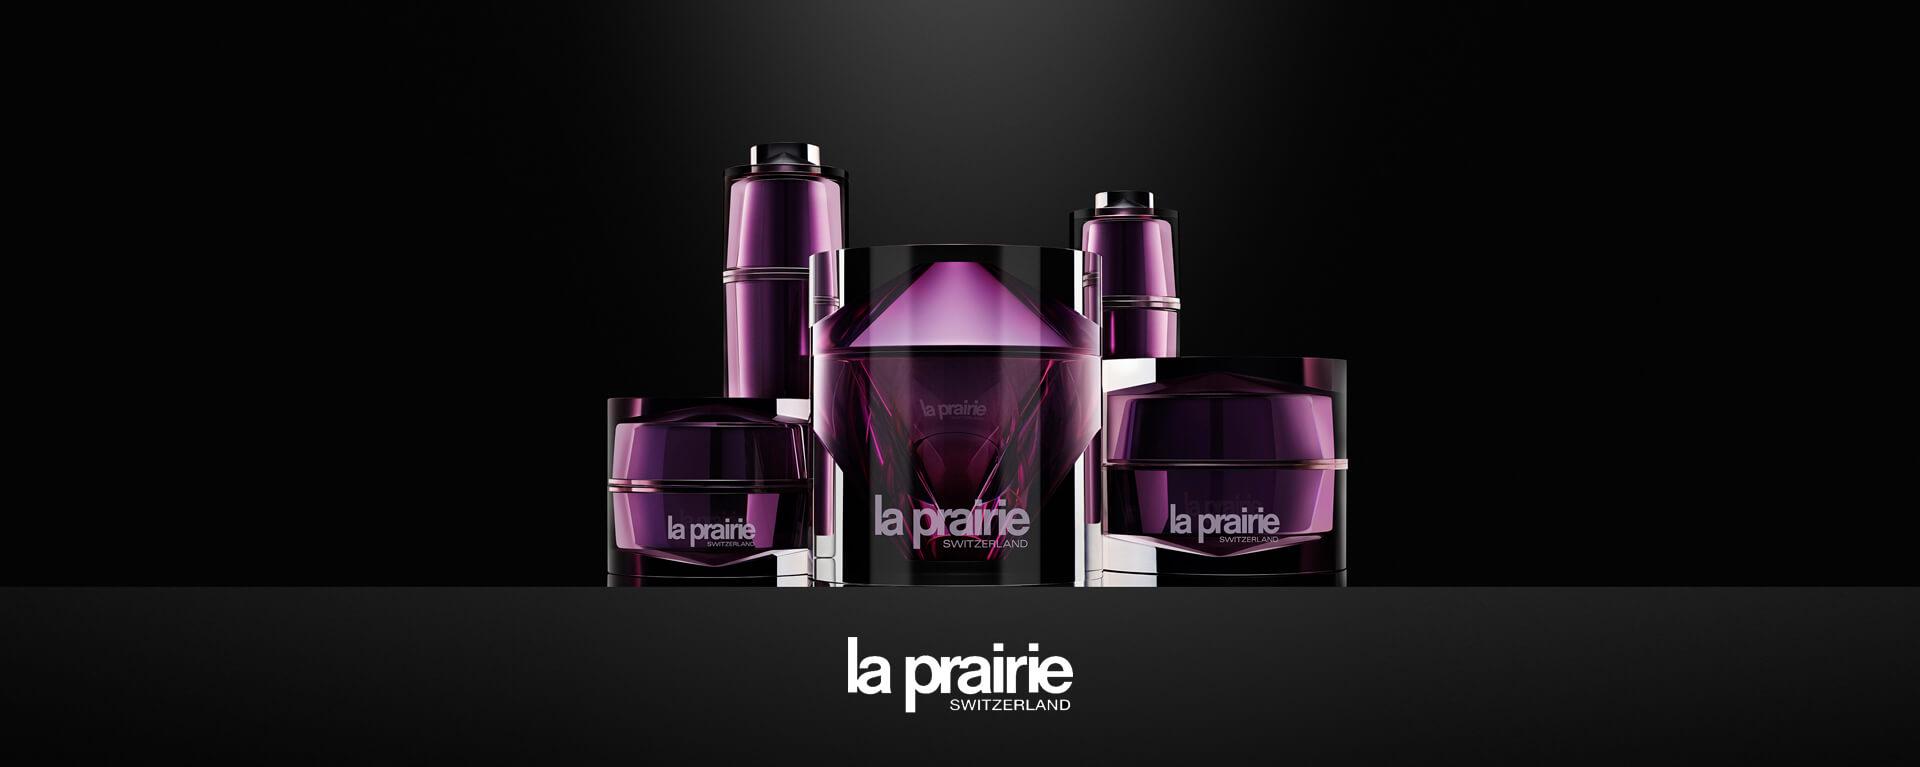 la-prairie-collection-banner-2